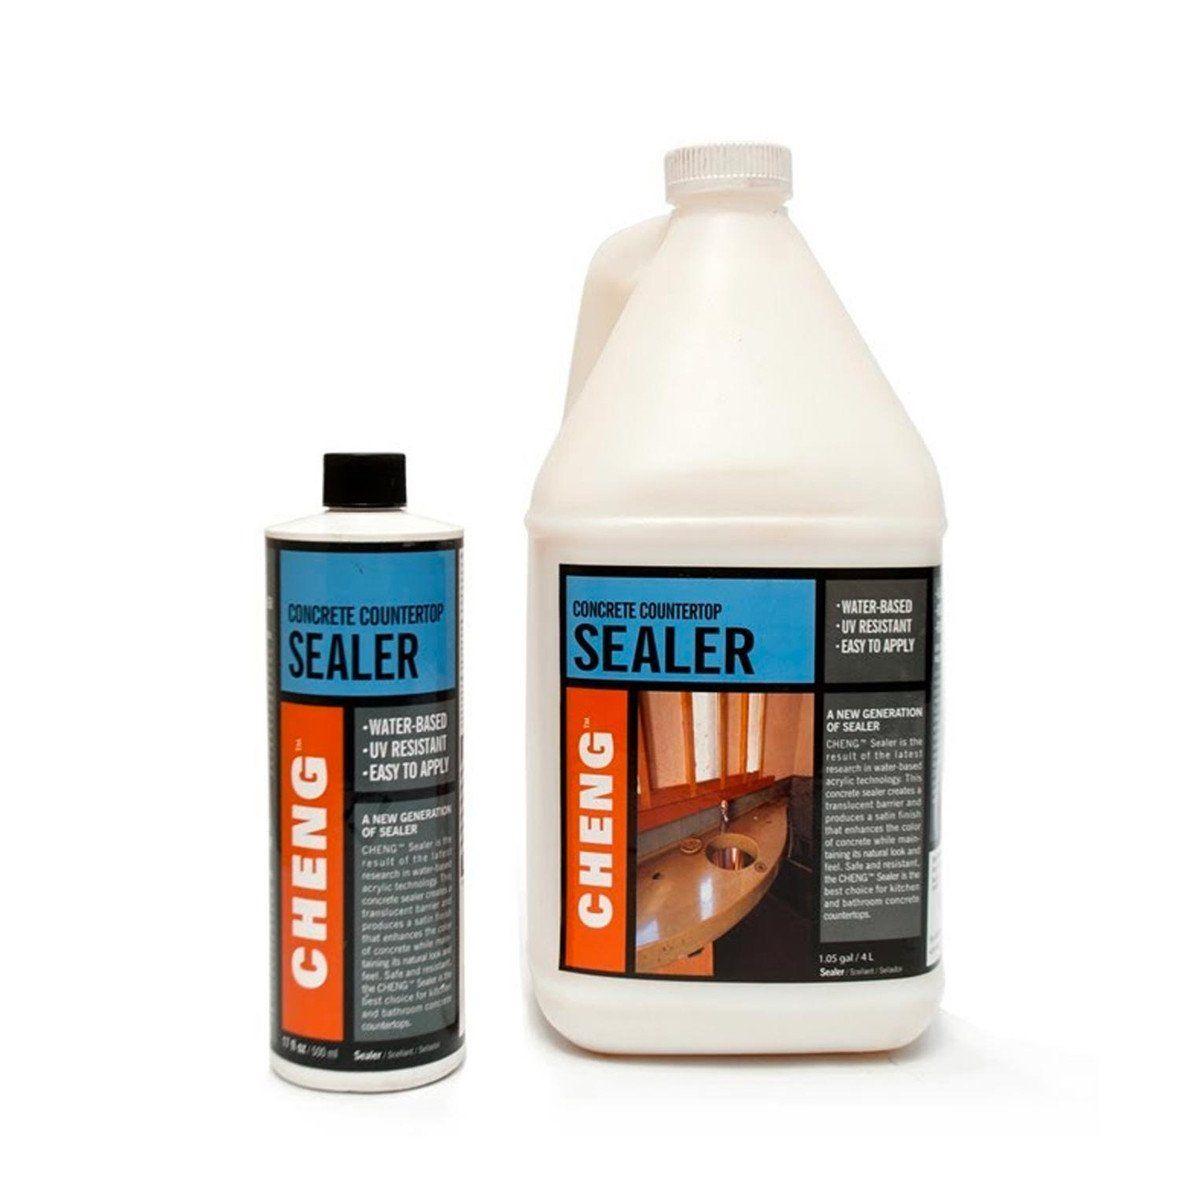 CHENG FoodSafe Concrete Countertop Sealer in 2020